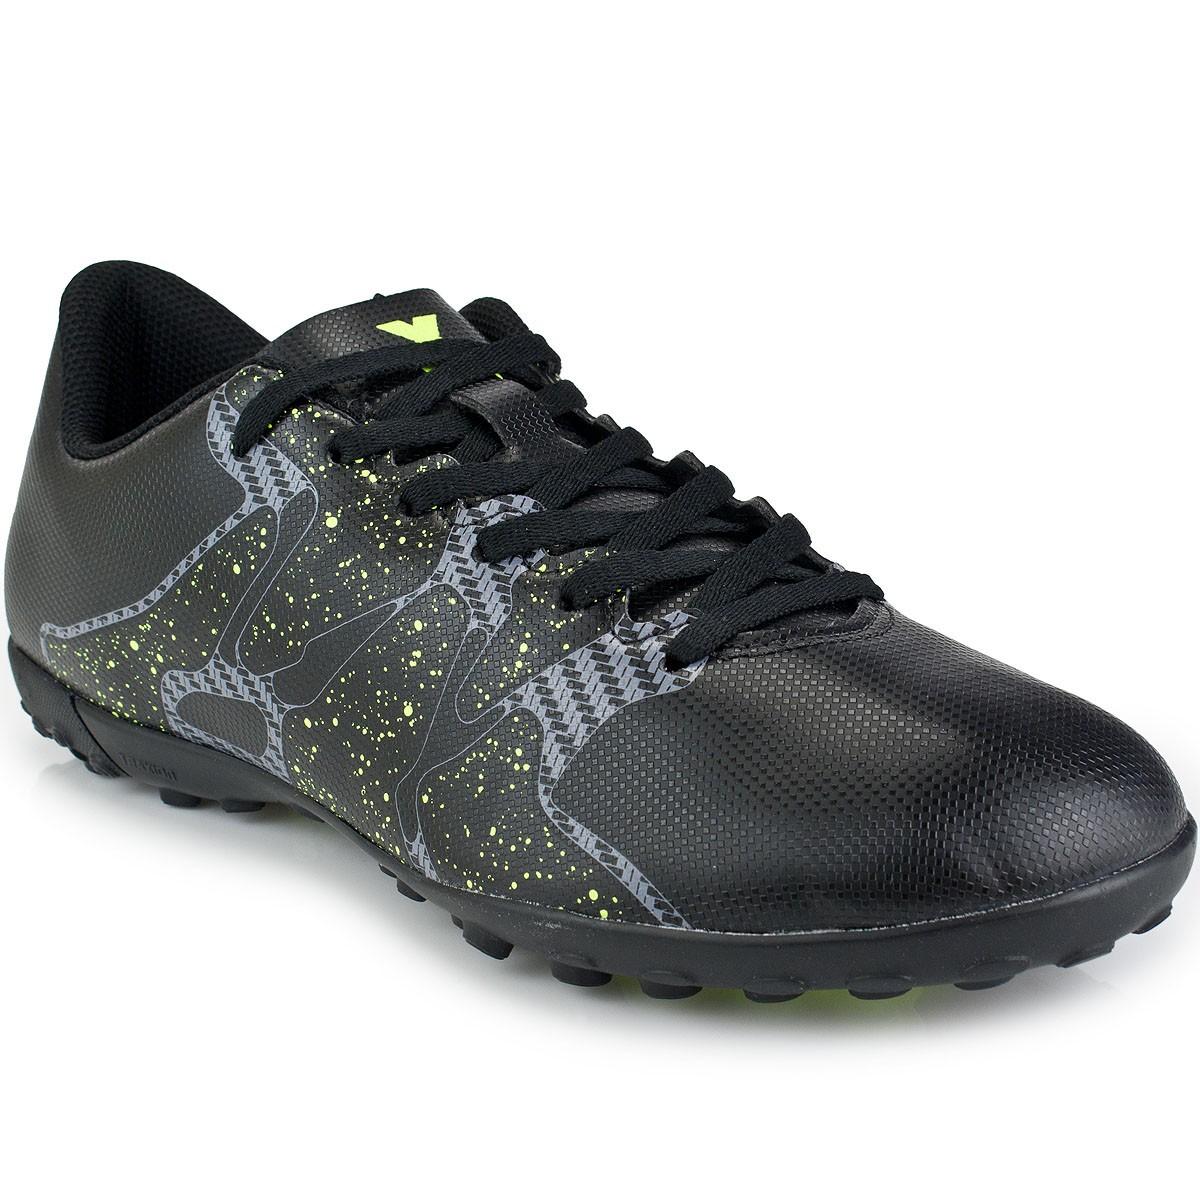 Chuteira Adidas X 15.4 TF B32948  a5d1dff4a19fc